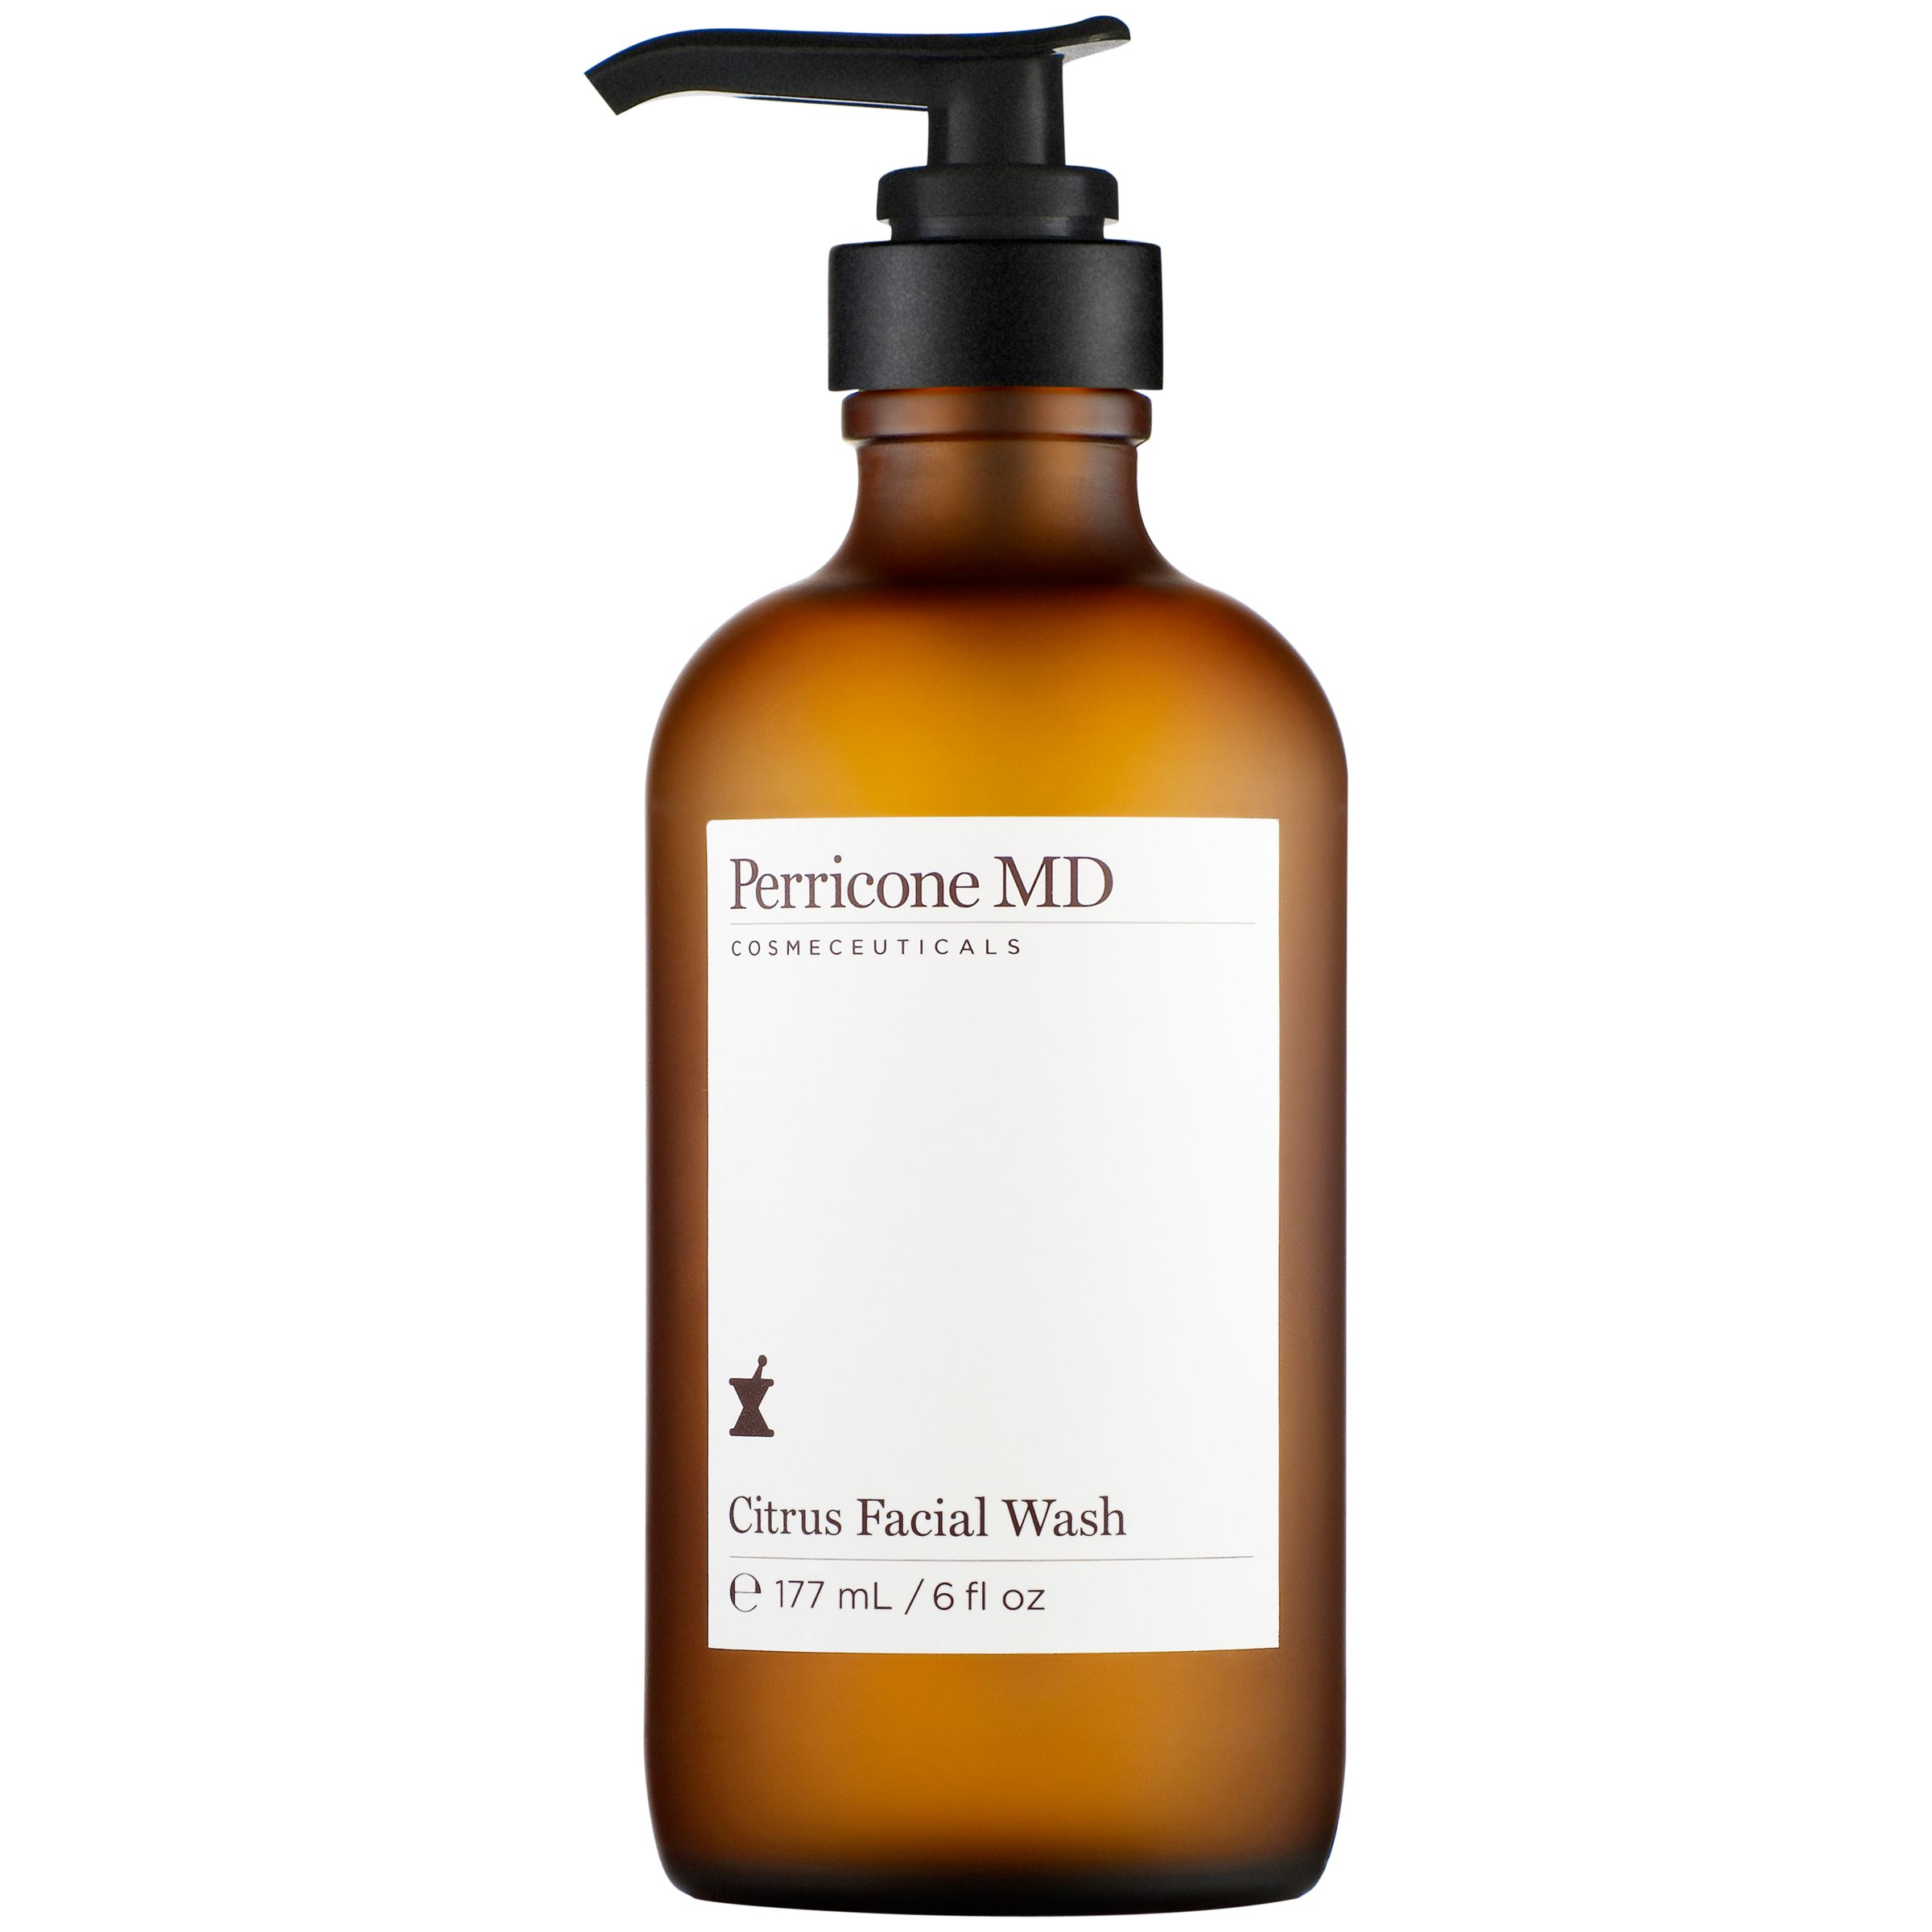 Perricone MD Perricone MD Citrus Facial Wash, 177ml